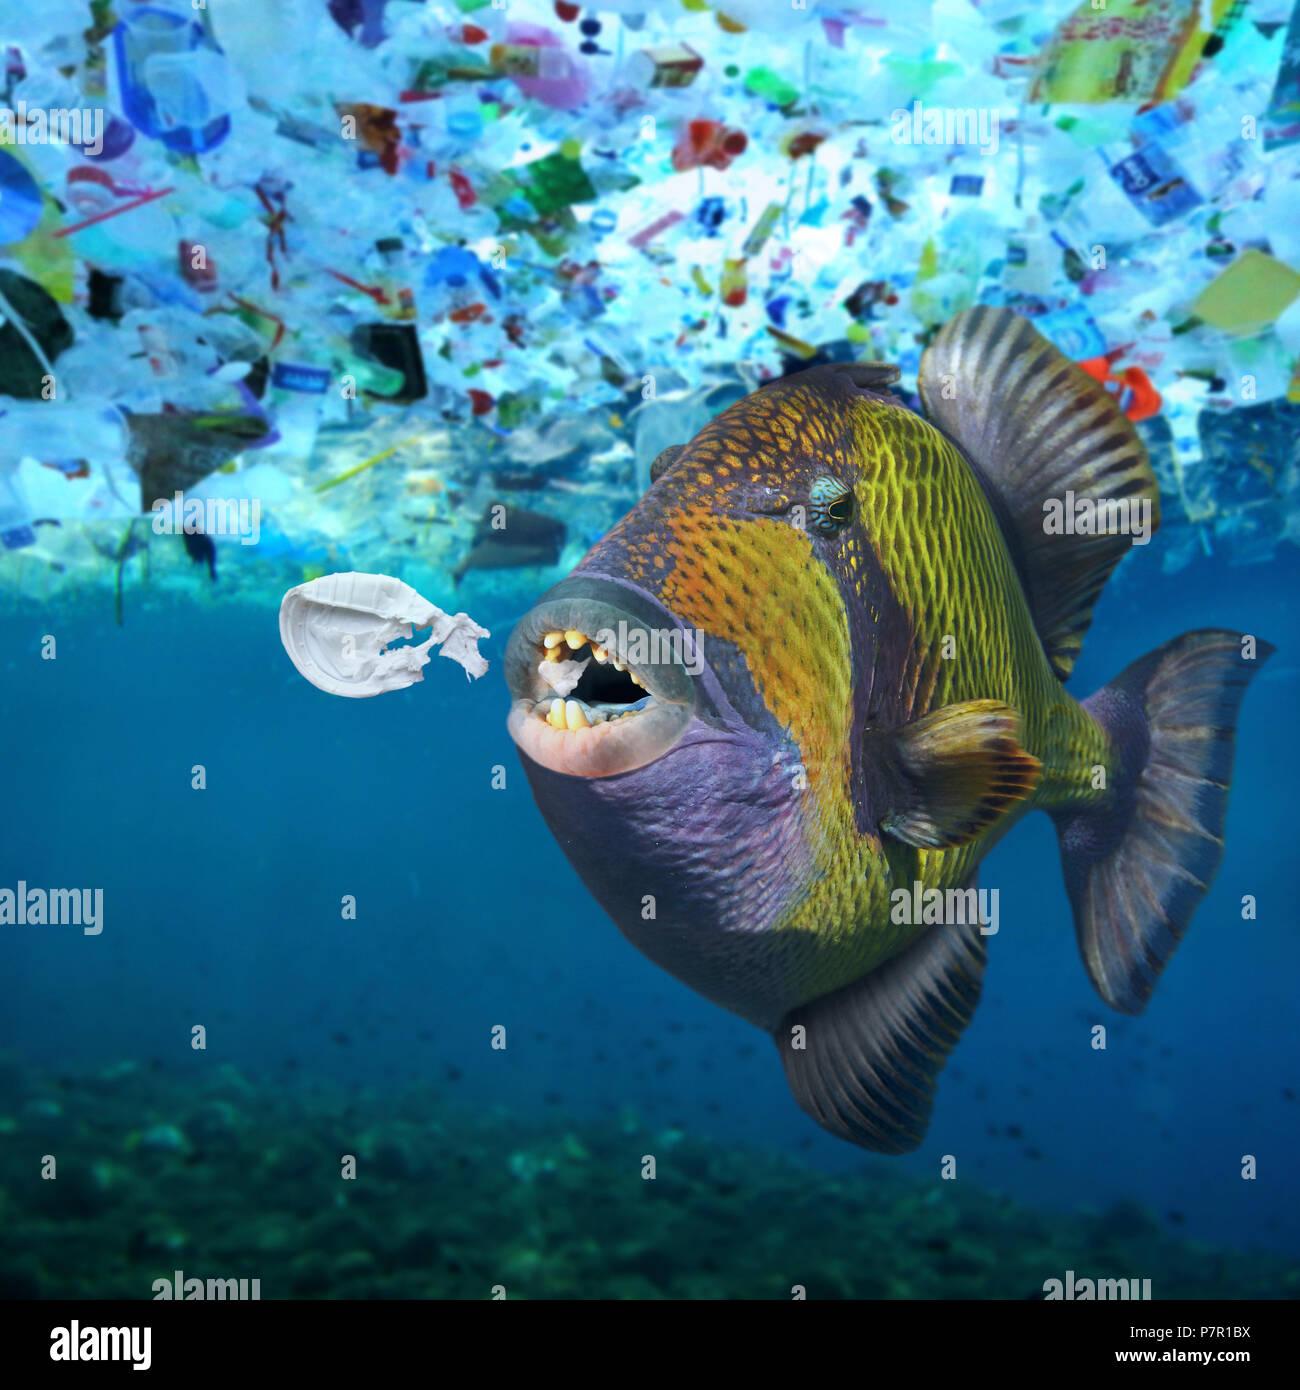 Titan triggerfish, Balistoides viridescens, eating a plastic object. - Stock Image